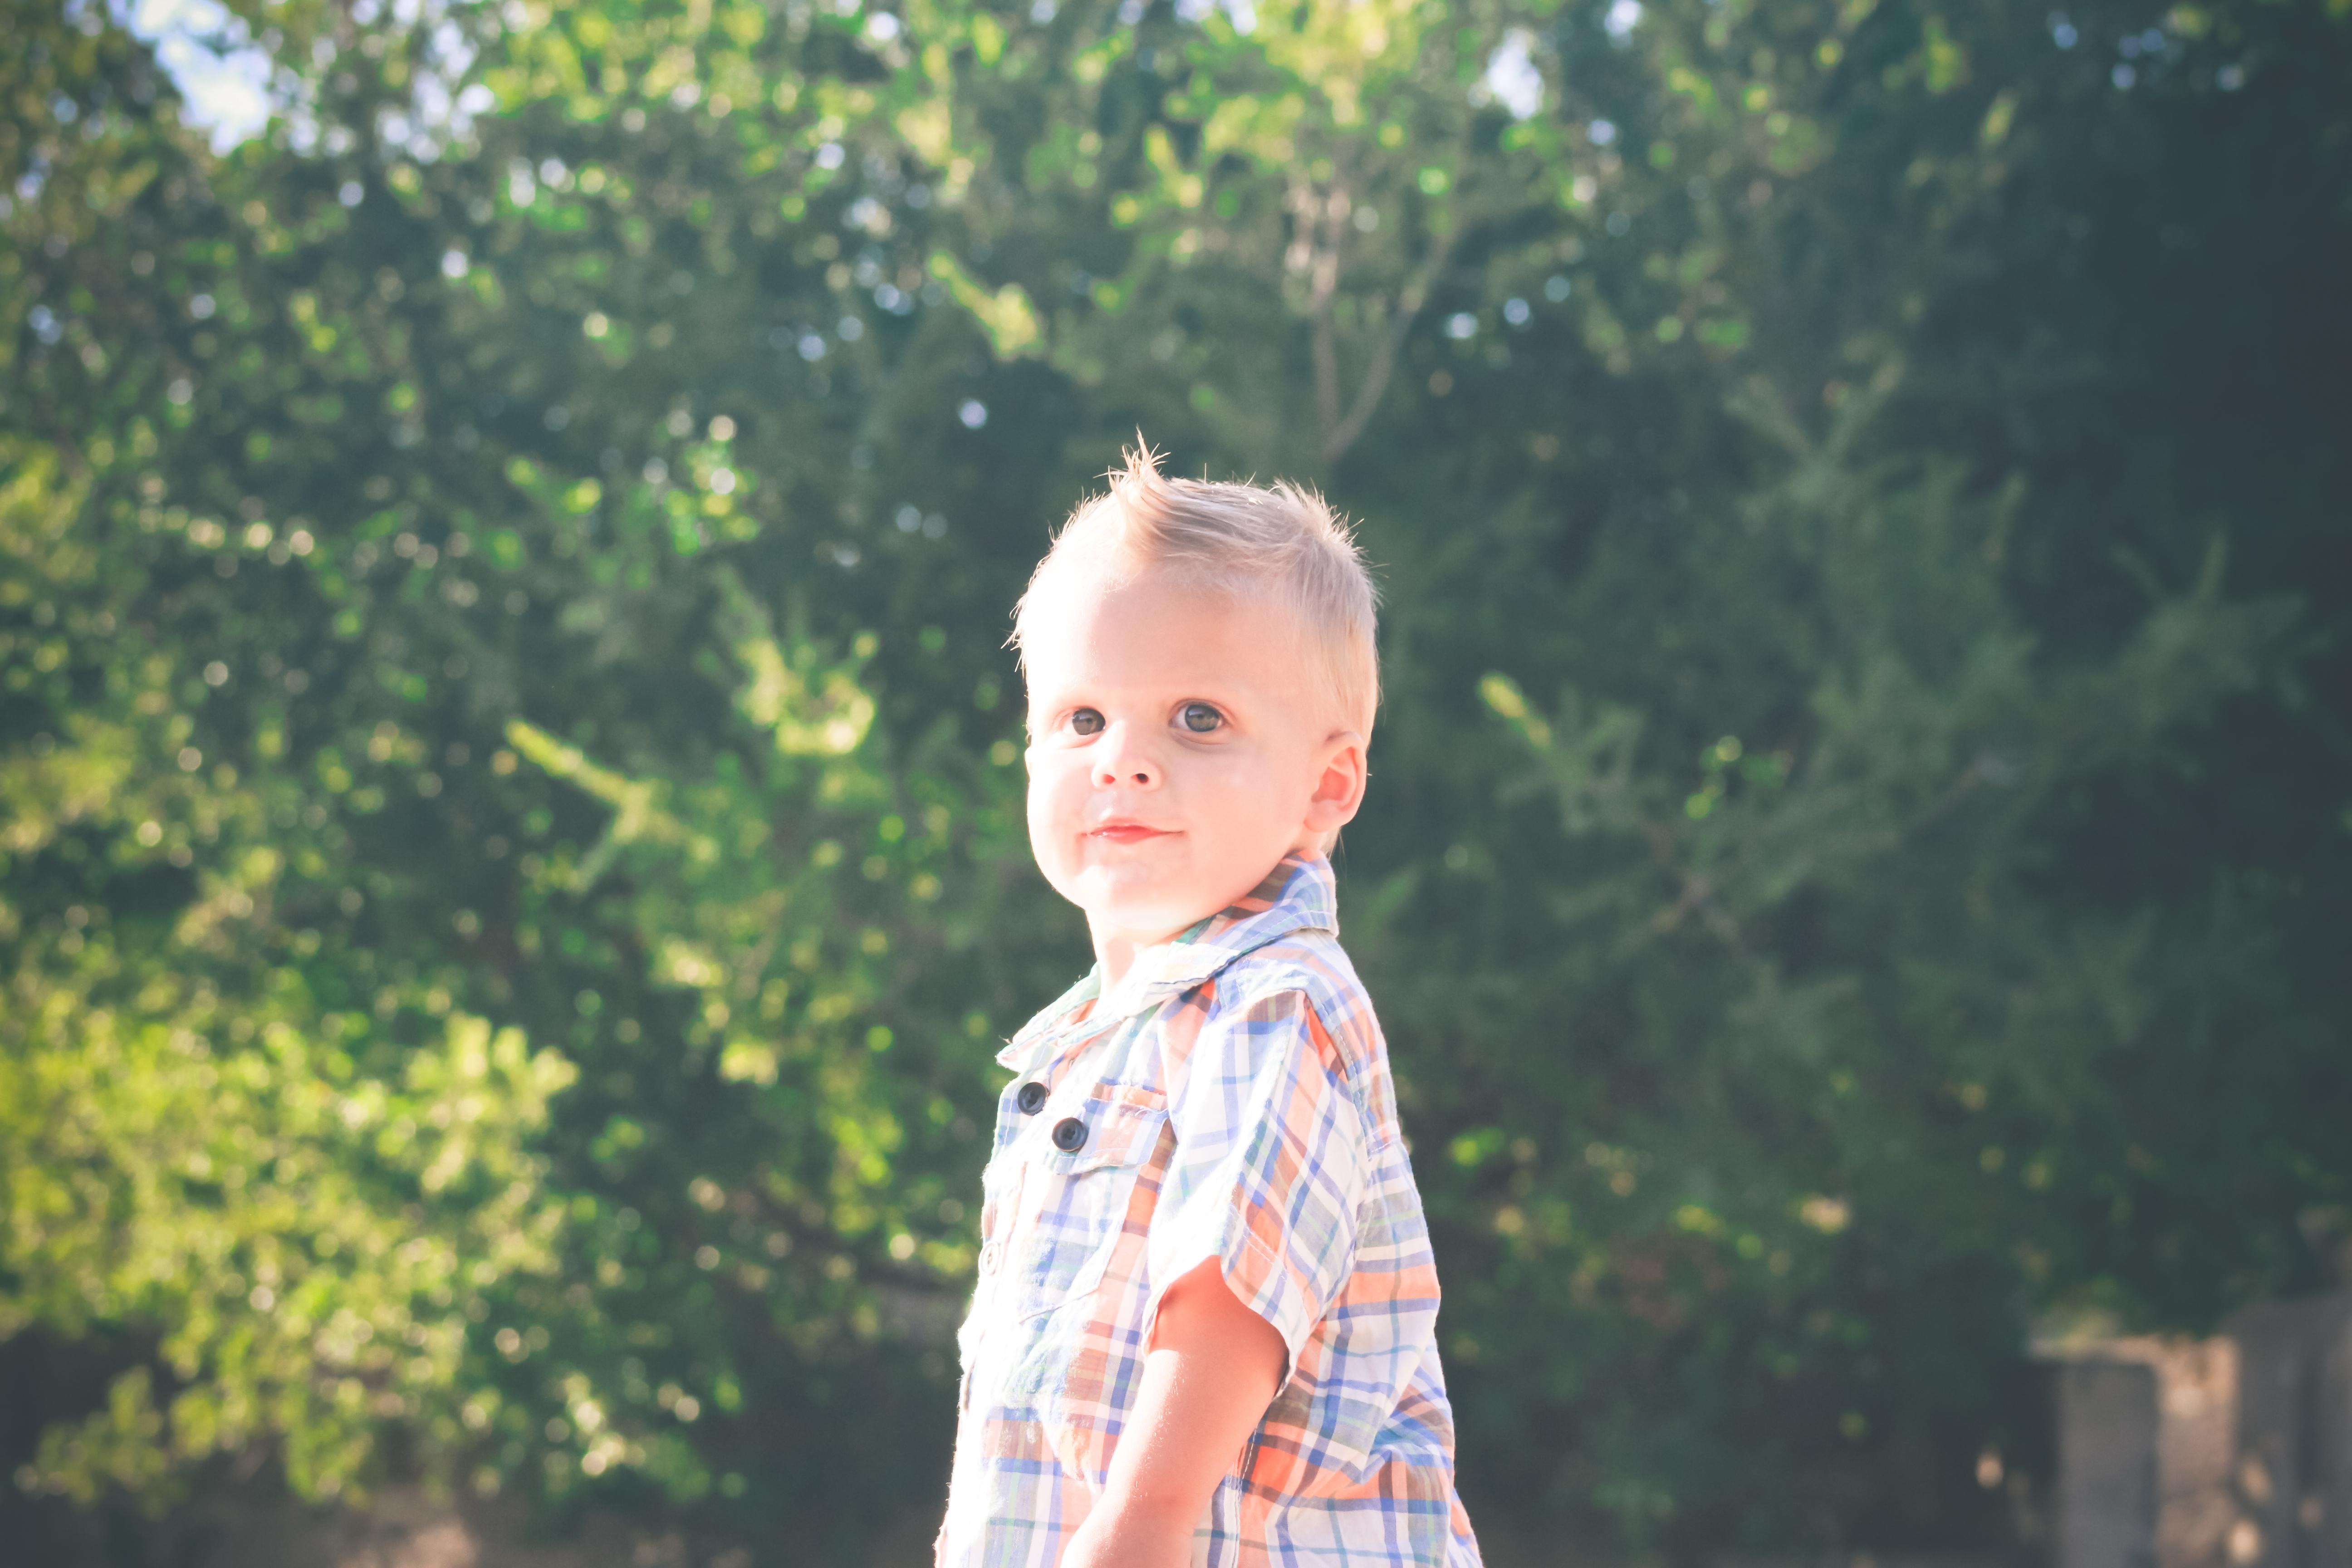 ventura county baby photographyjune 15, 2013-img_0456